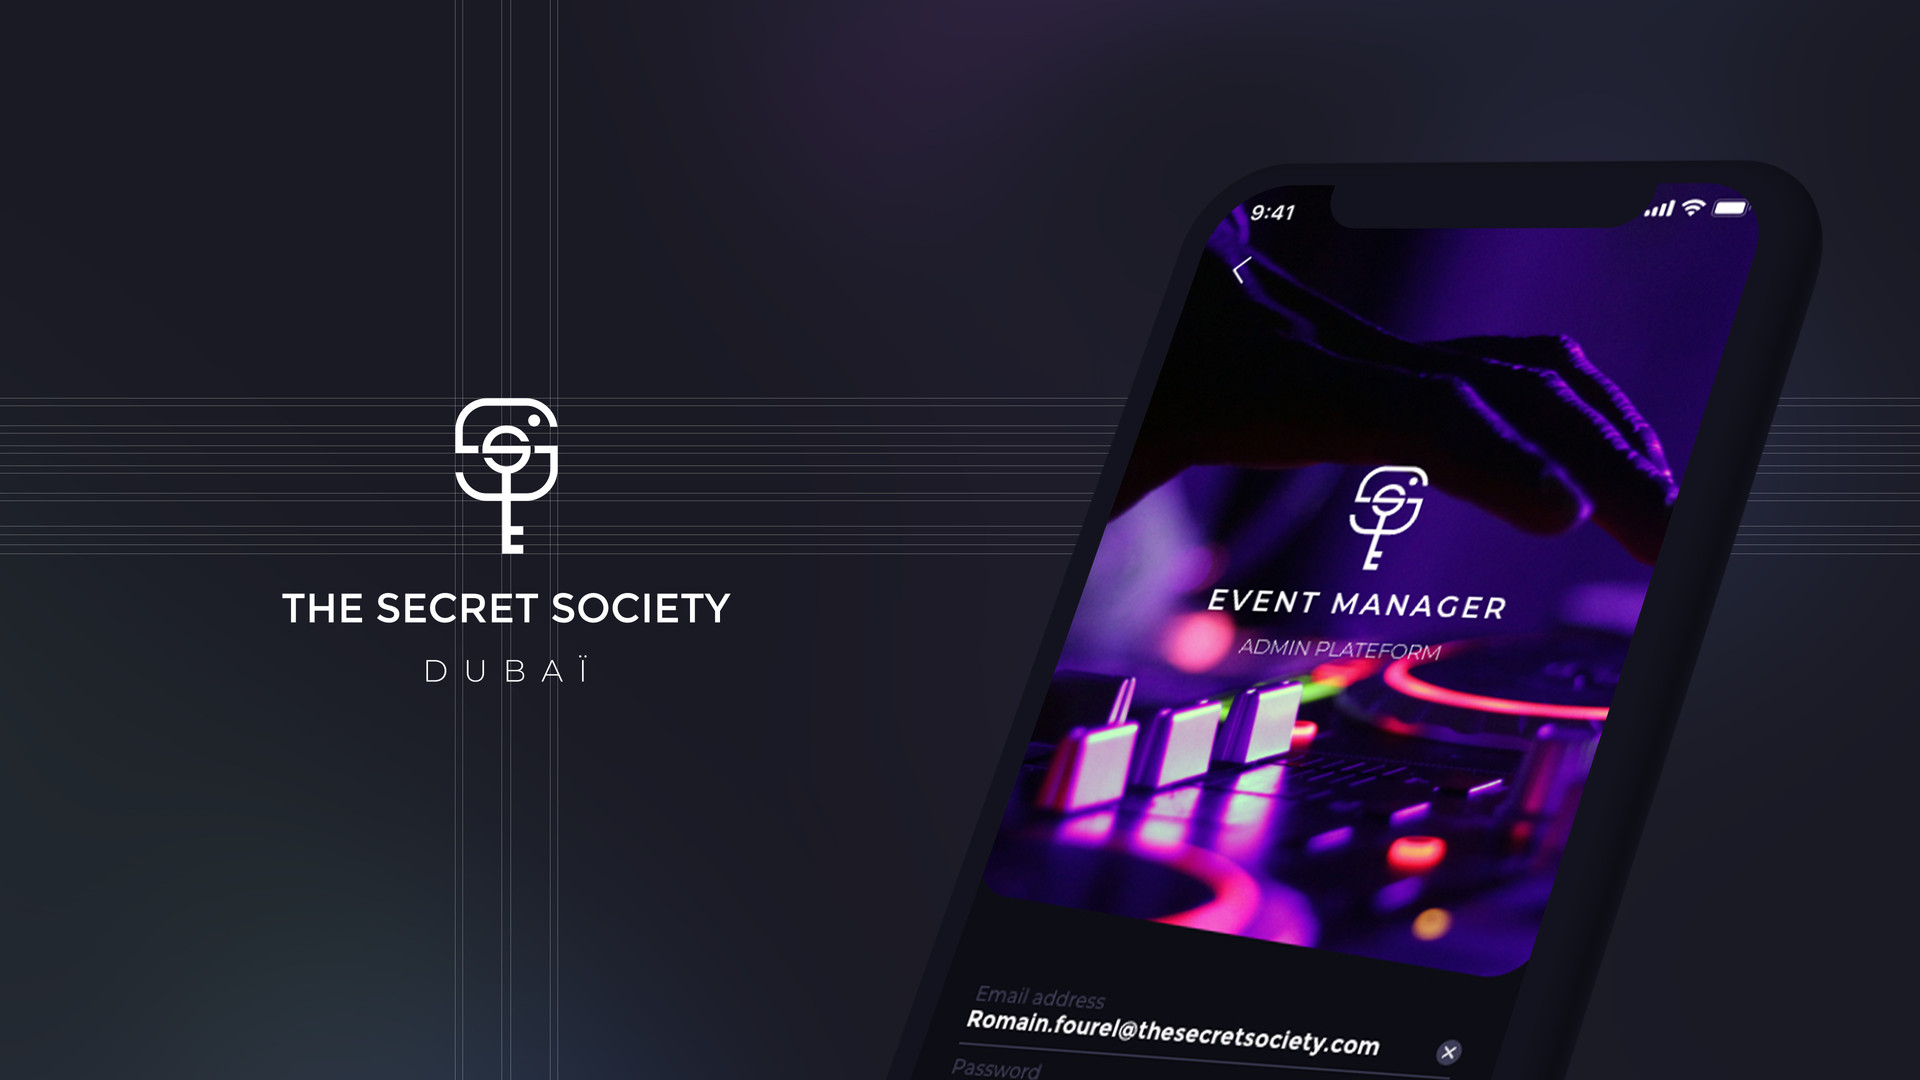 thesecretsociety-app2.jpg